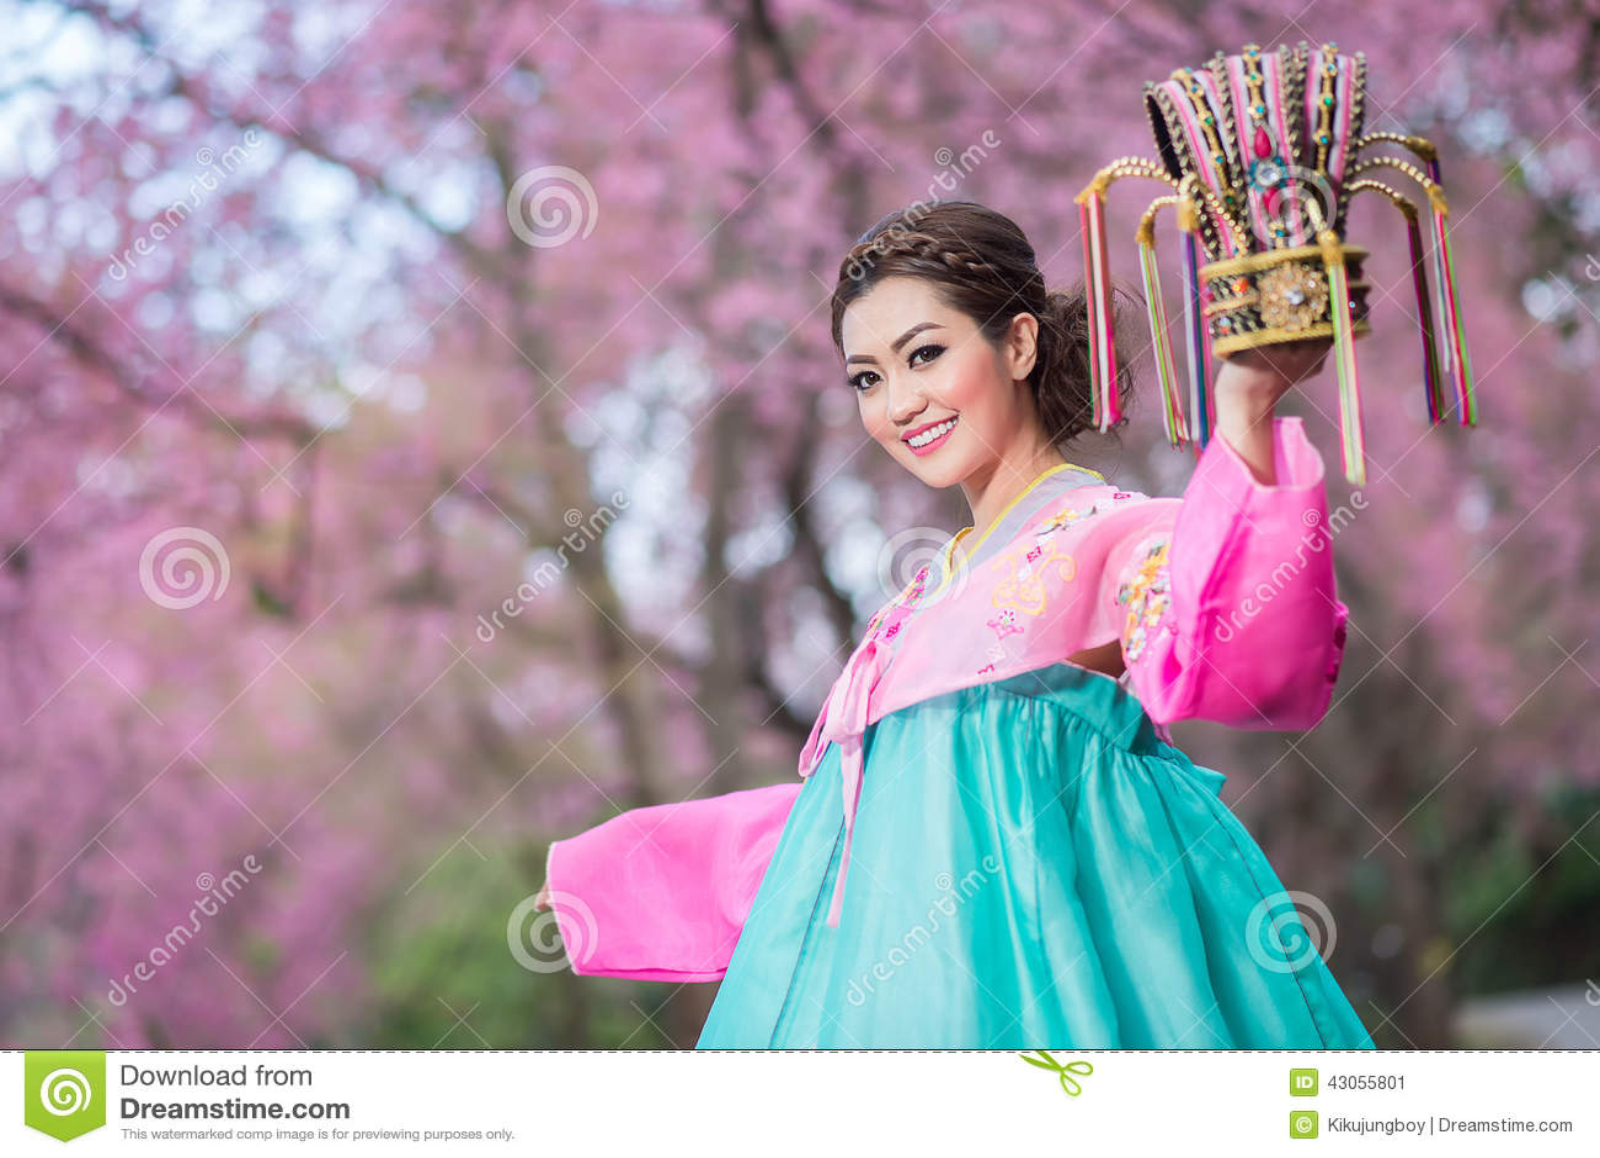 Hanbok: the traditional Korean dress and beautiful Asian girl holding crowd with sakura